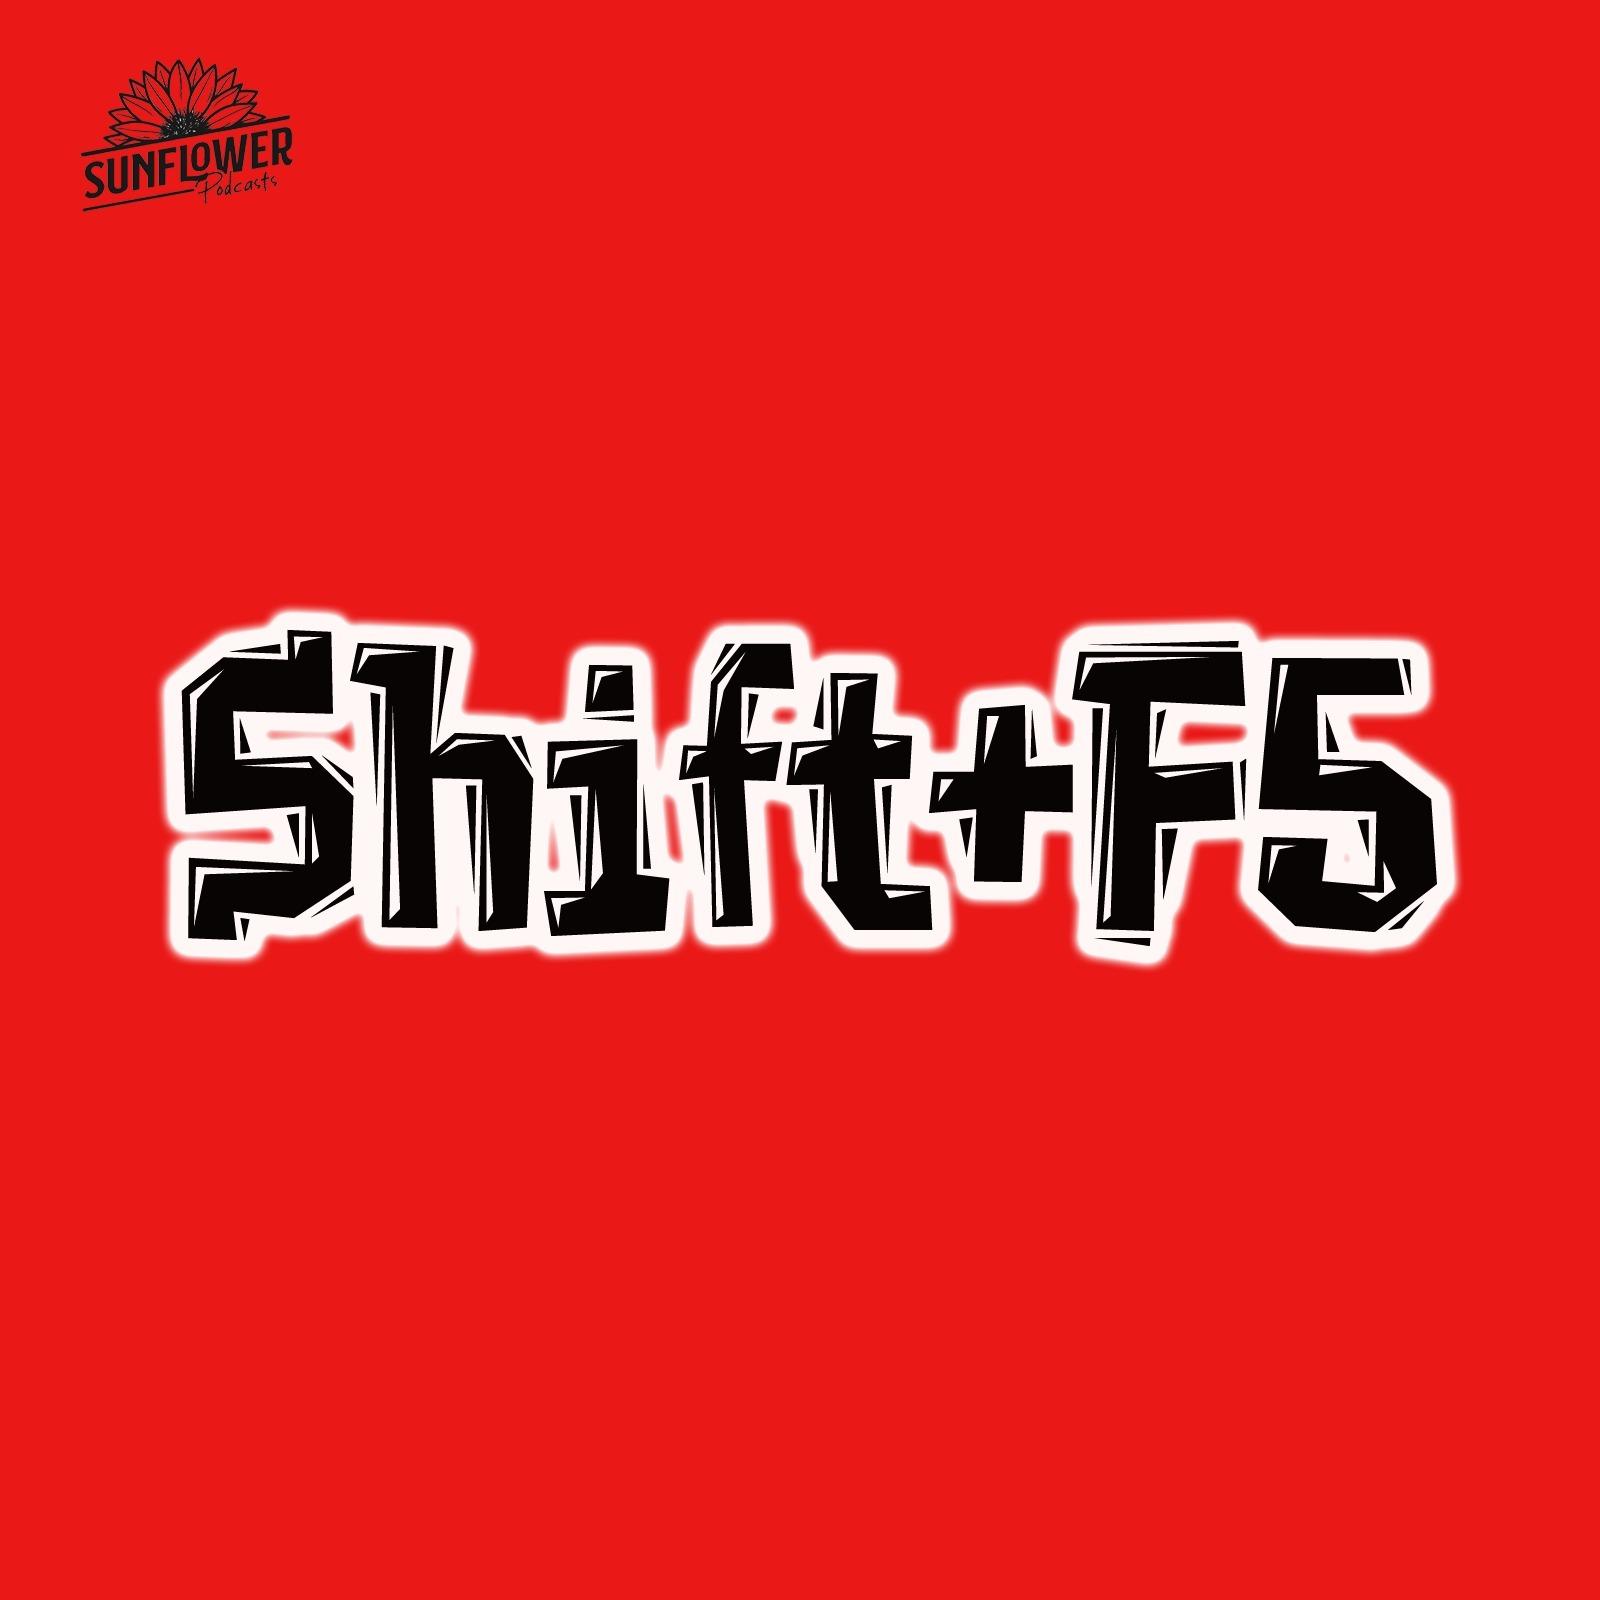 #101 - SHIFT+F5 - Mete coronavento na bisa,e corre Consuelo ! EP1